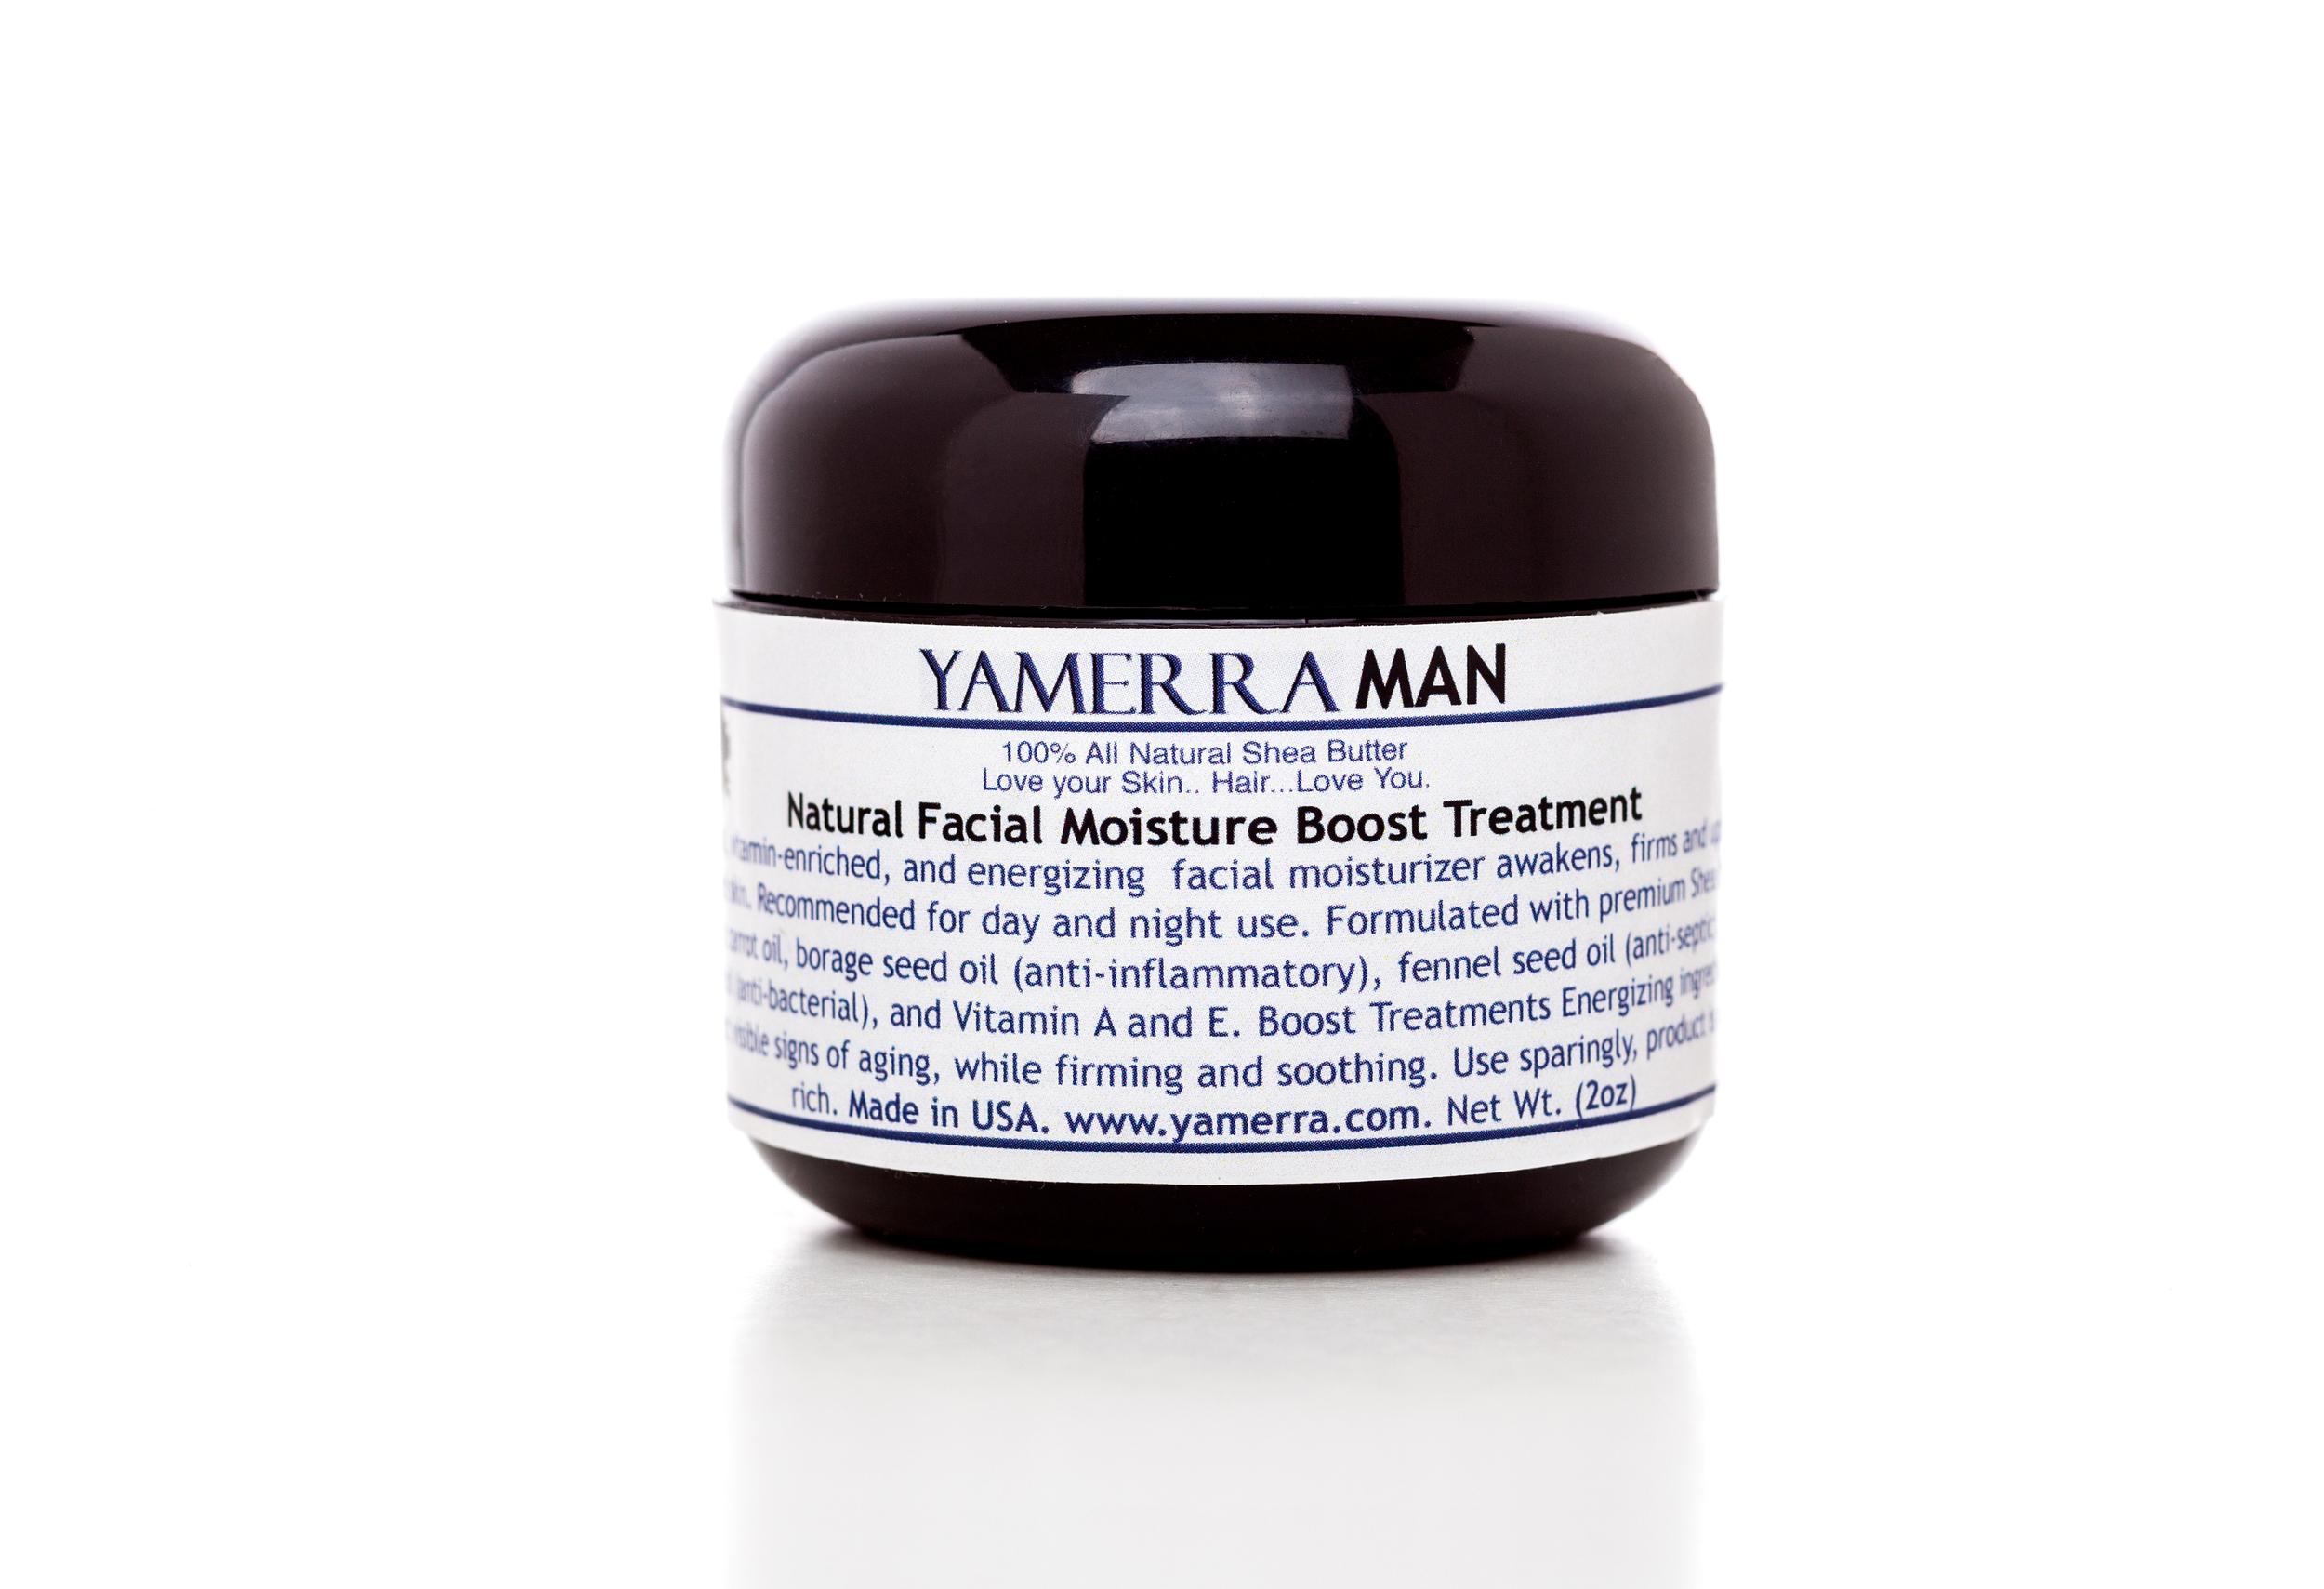 Products__YAMERRA-0338.jpg